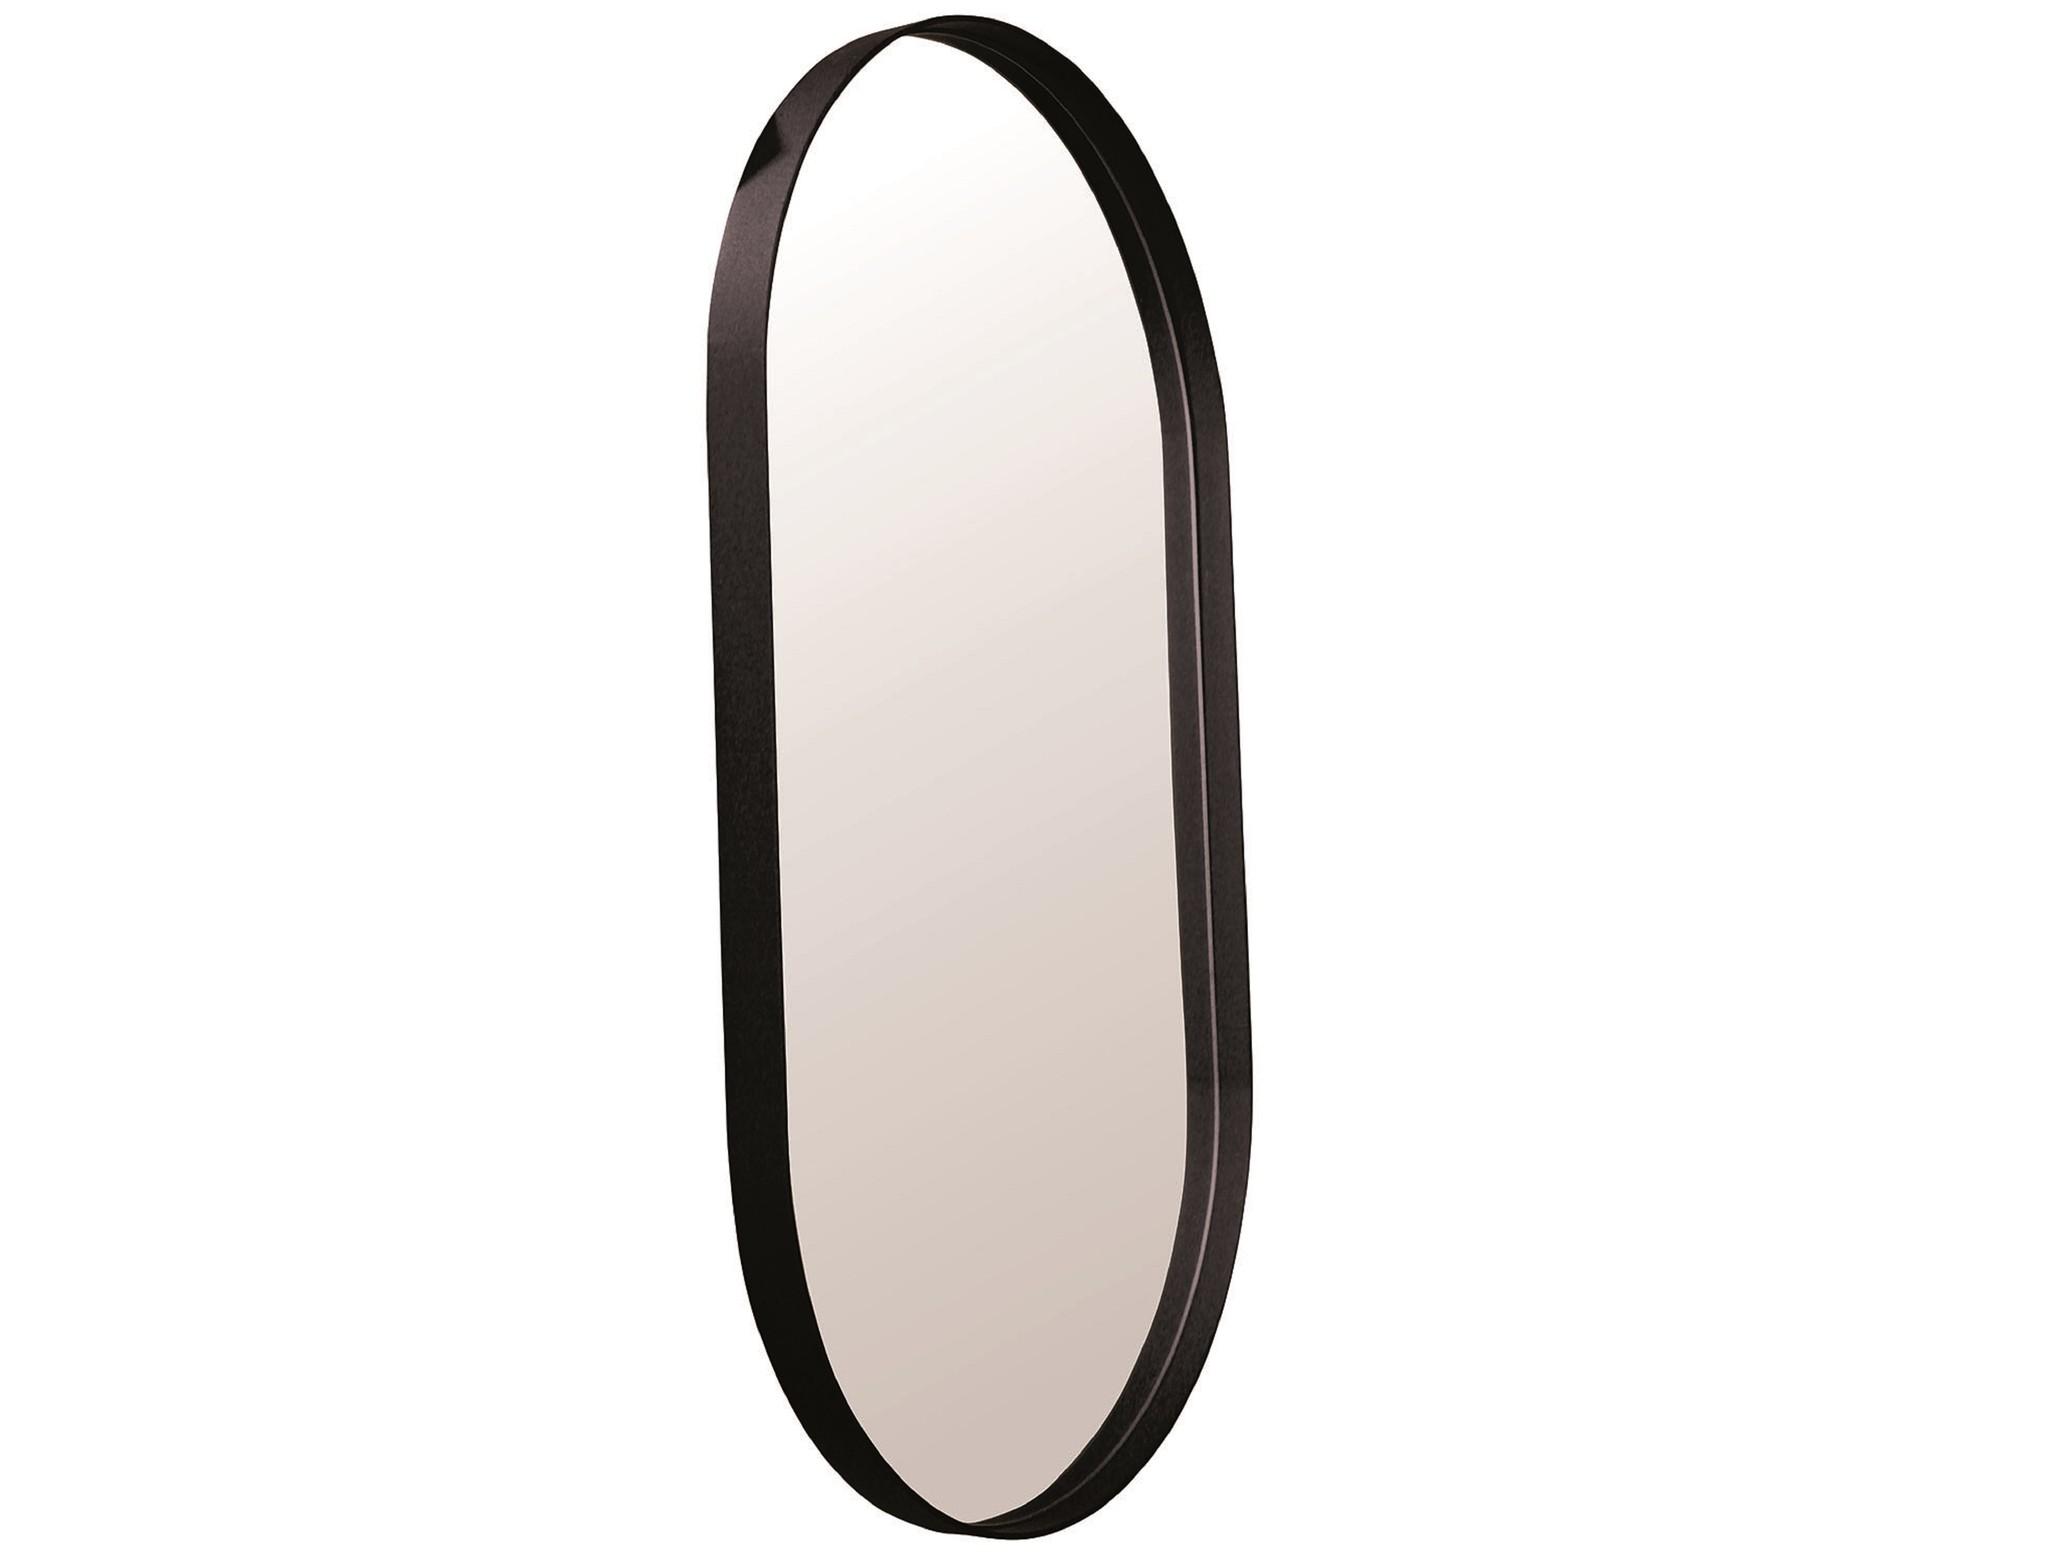 Настенное зеркало ванда 80*40 (simple mirror) черный 40.0x80.0x4.0 см.